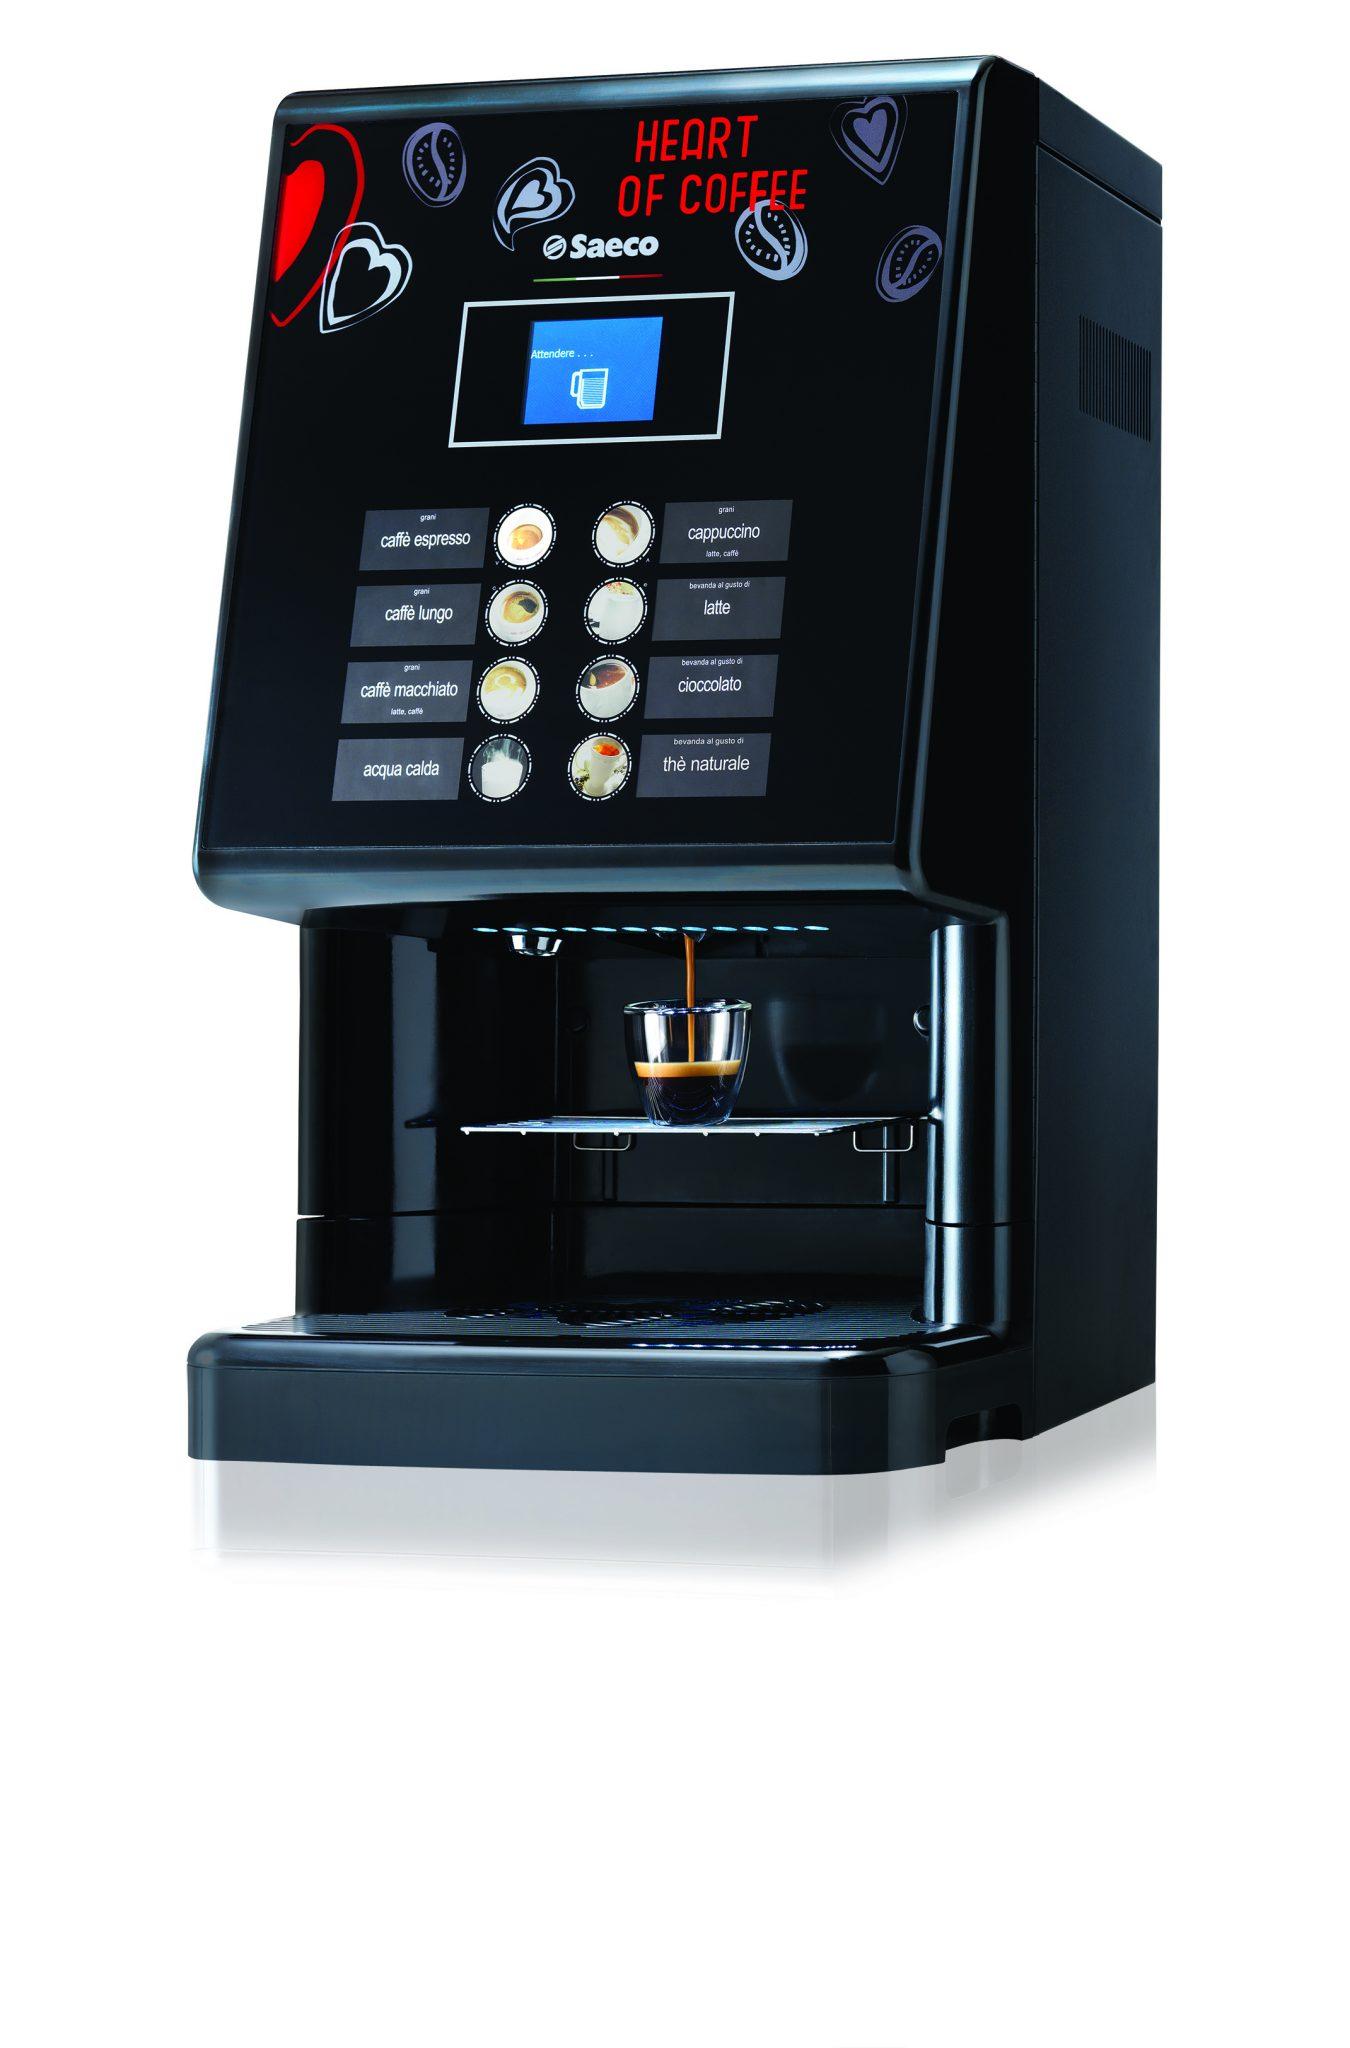 Saeco Phedra Evo Espresso Table Top Vending Coffee Machine The Coffee Scent